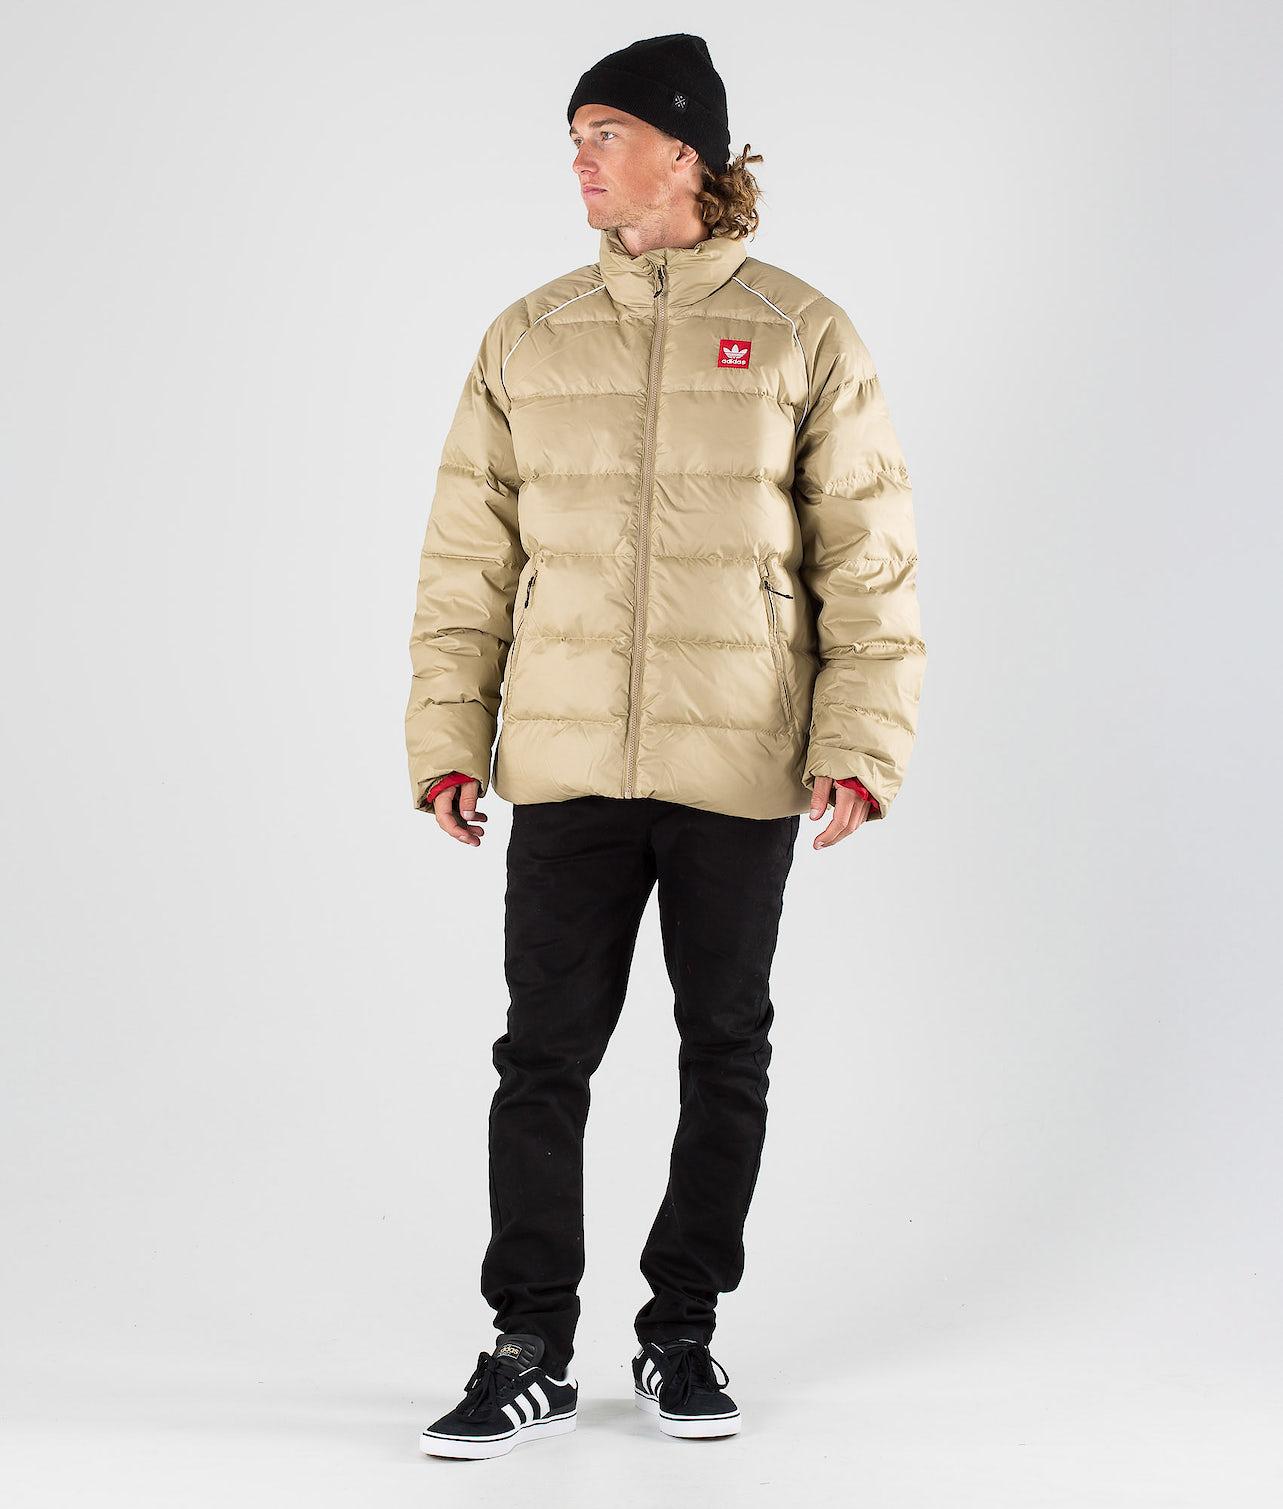 Adidas Skateboarding Adicol Jacket 1 Jakke Hemp/Power Red